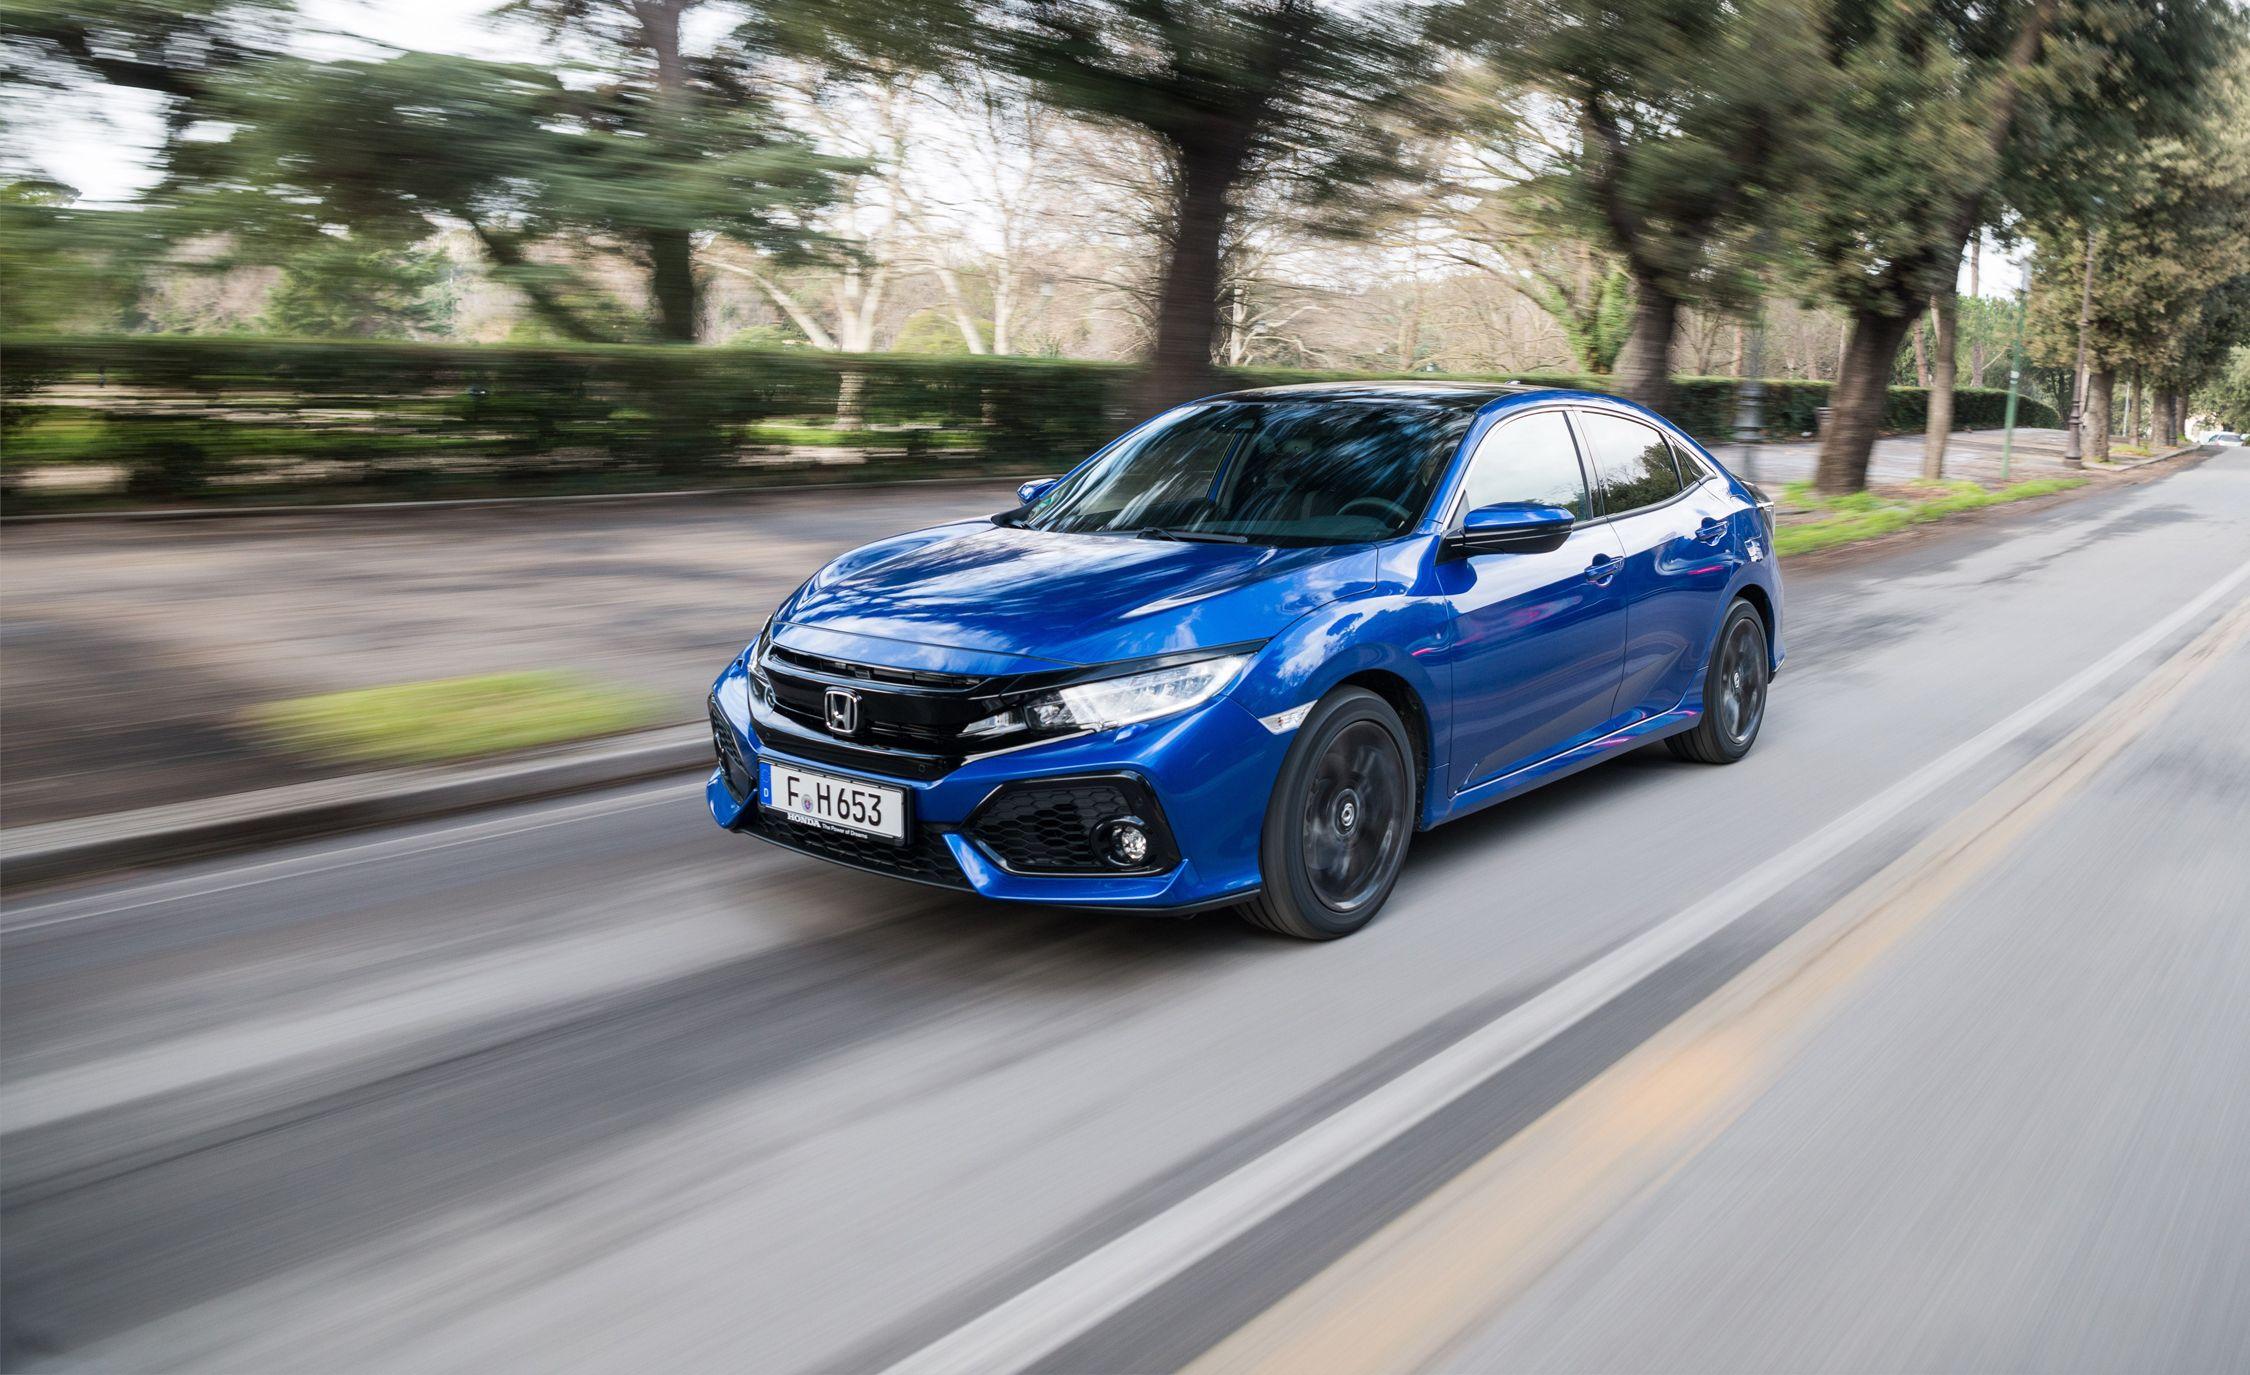 Honda civic i dtec diesel first drive review car and driver photo 702537 s original